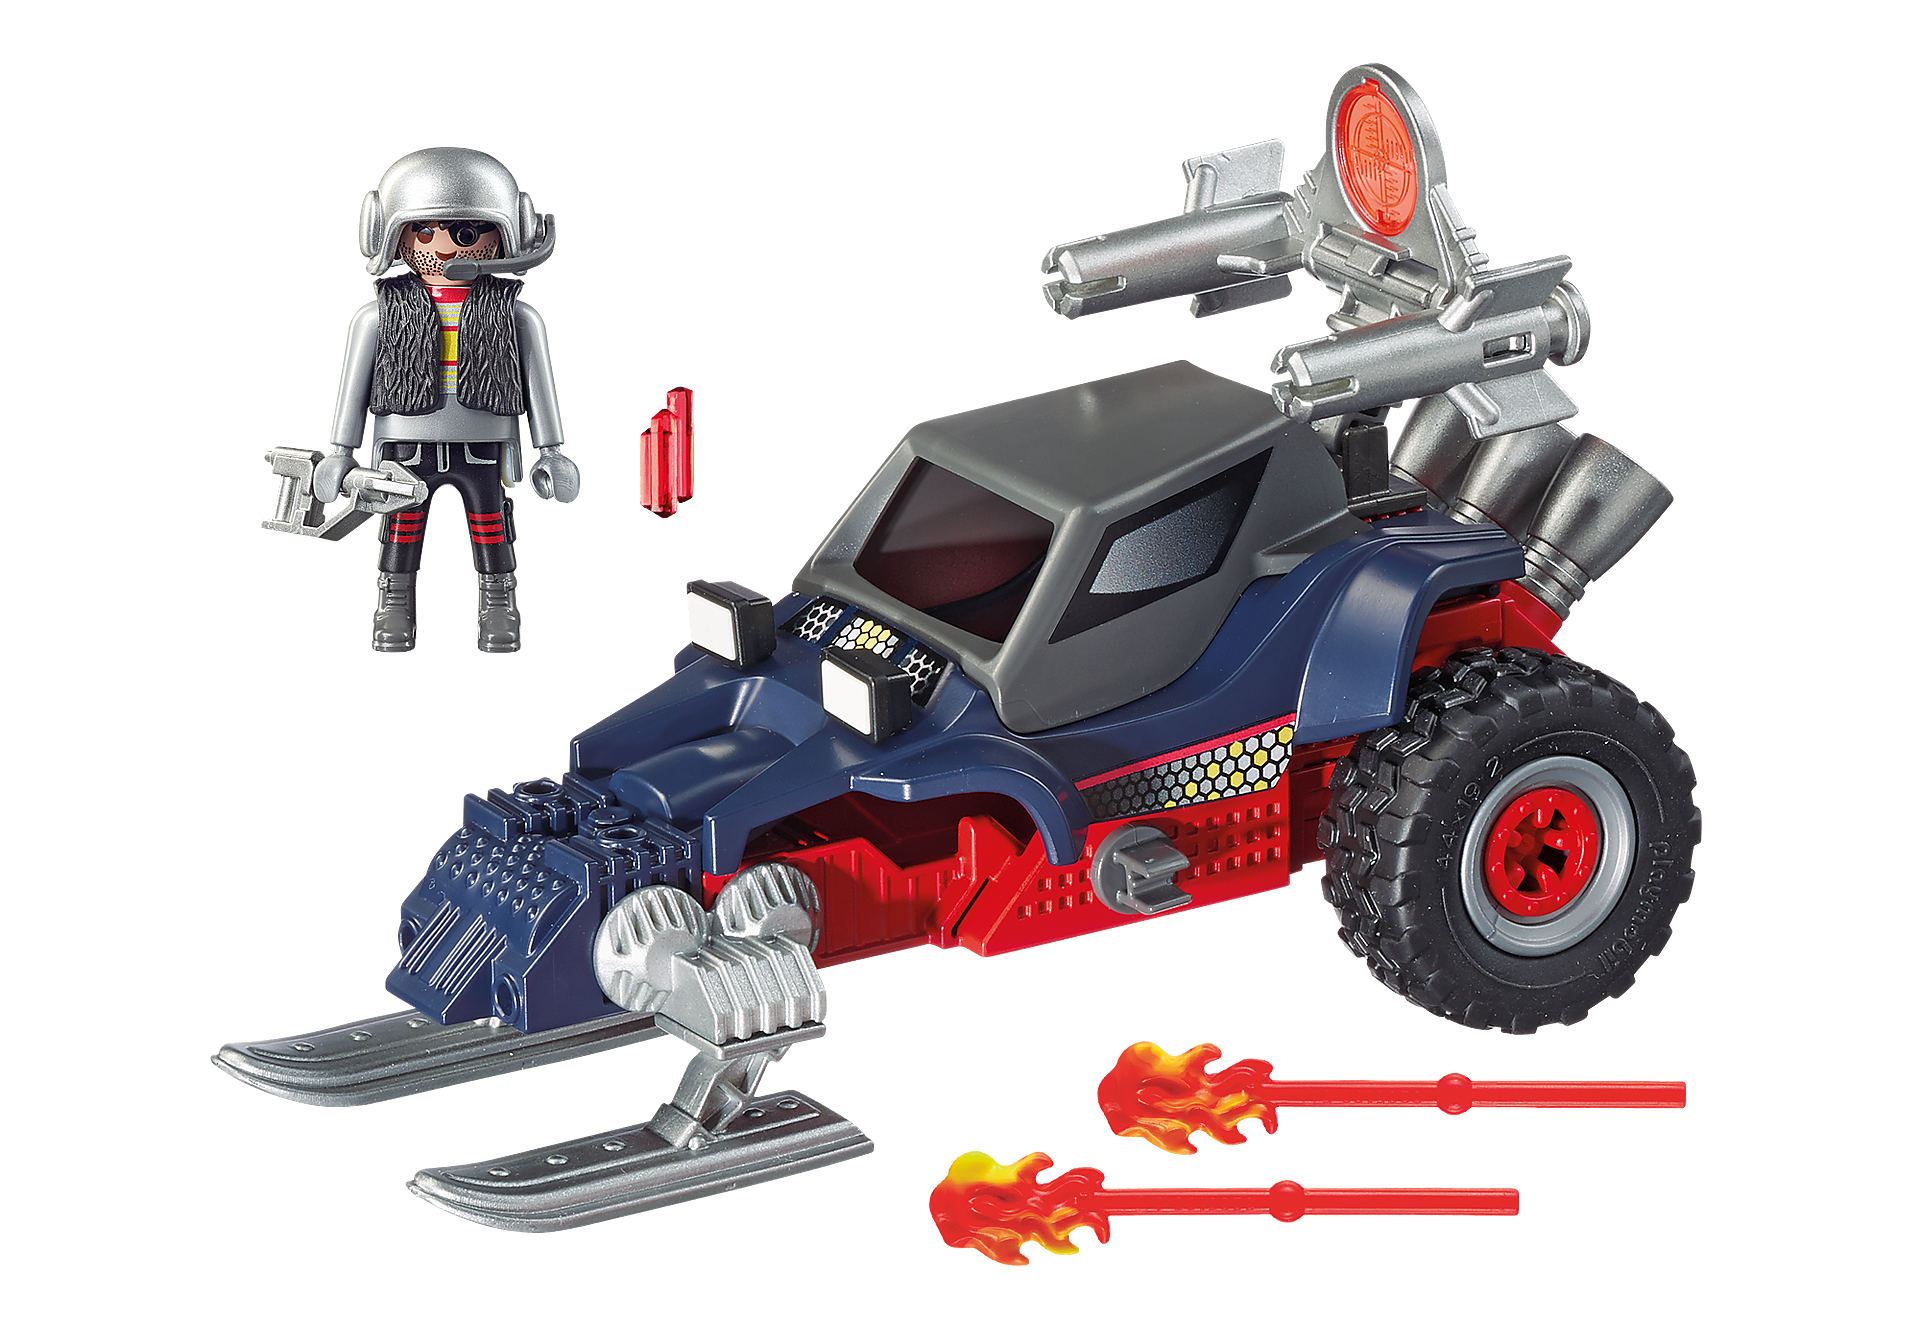 http://media.playmobil.com/i/playmobil/9058_product_box_back/Eispiraten-Racer